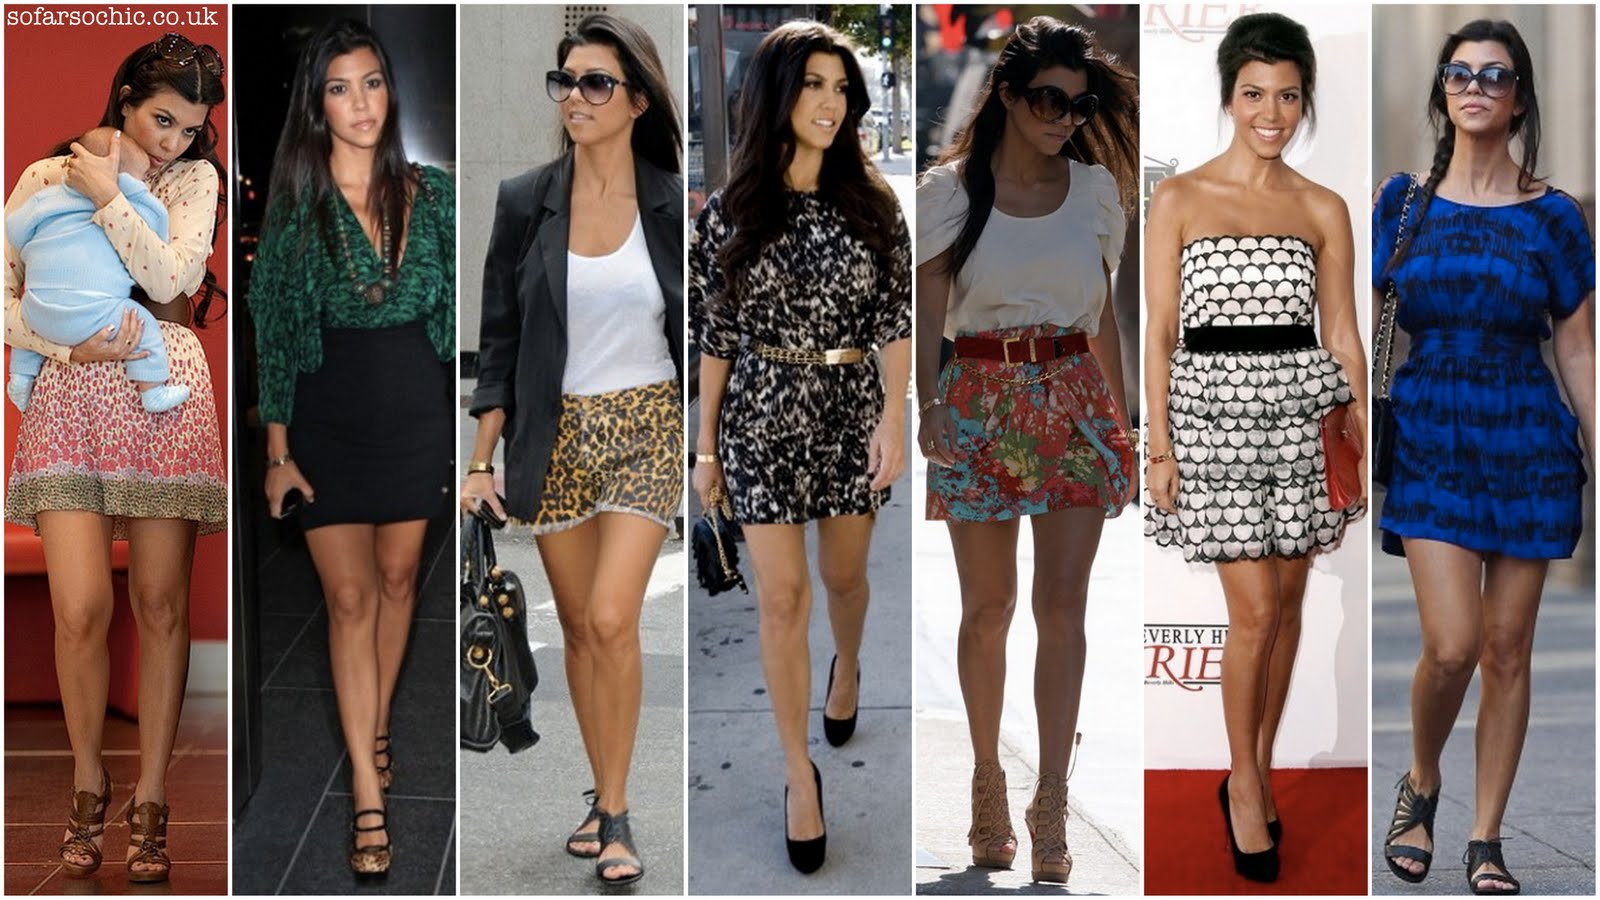 http://2.bp.blogspot.com/-ewkhFLOZO9A/T797HKo_QjI/AAAAAAAAABY/689AuAxlLI8/s1600/kourtney+kardashian+style1.jpg